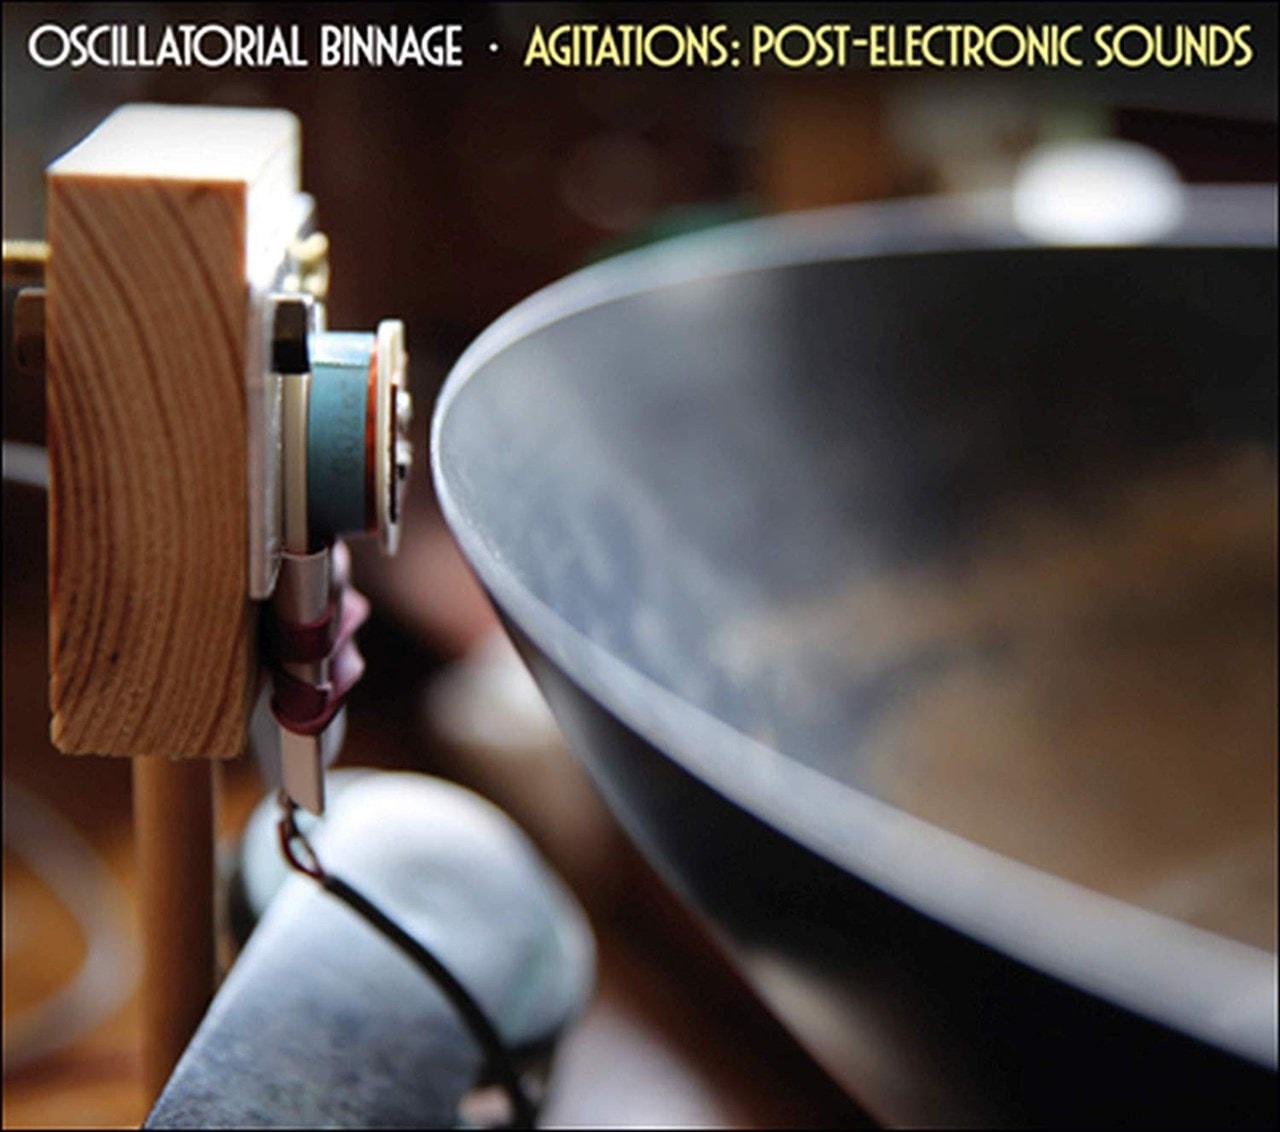 Agitations: Post-electronic Sounds - 1